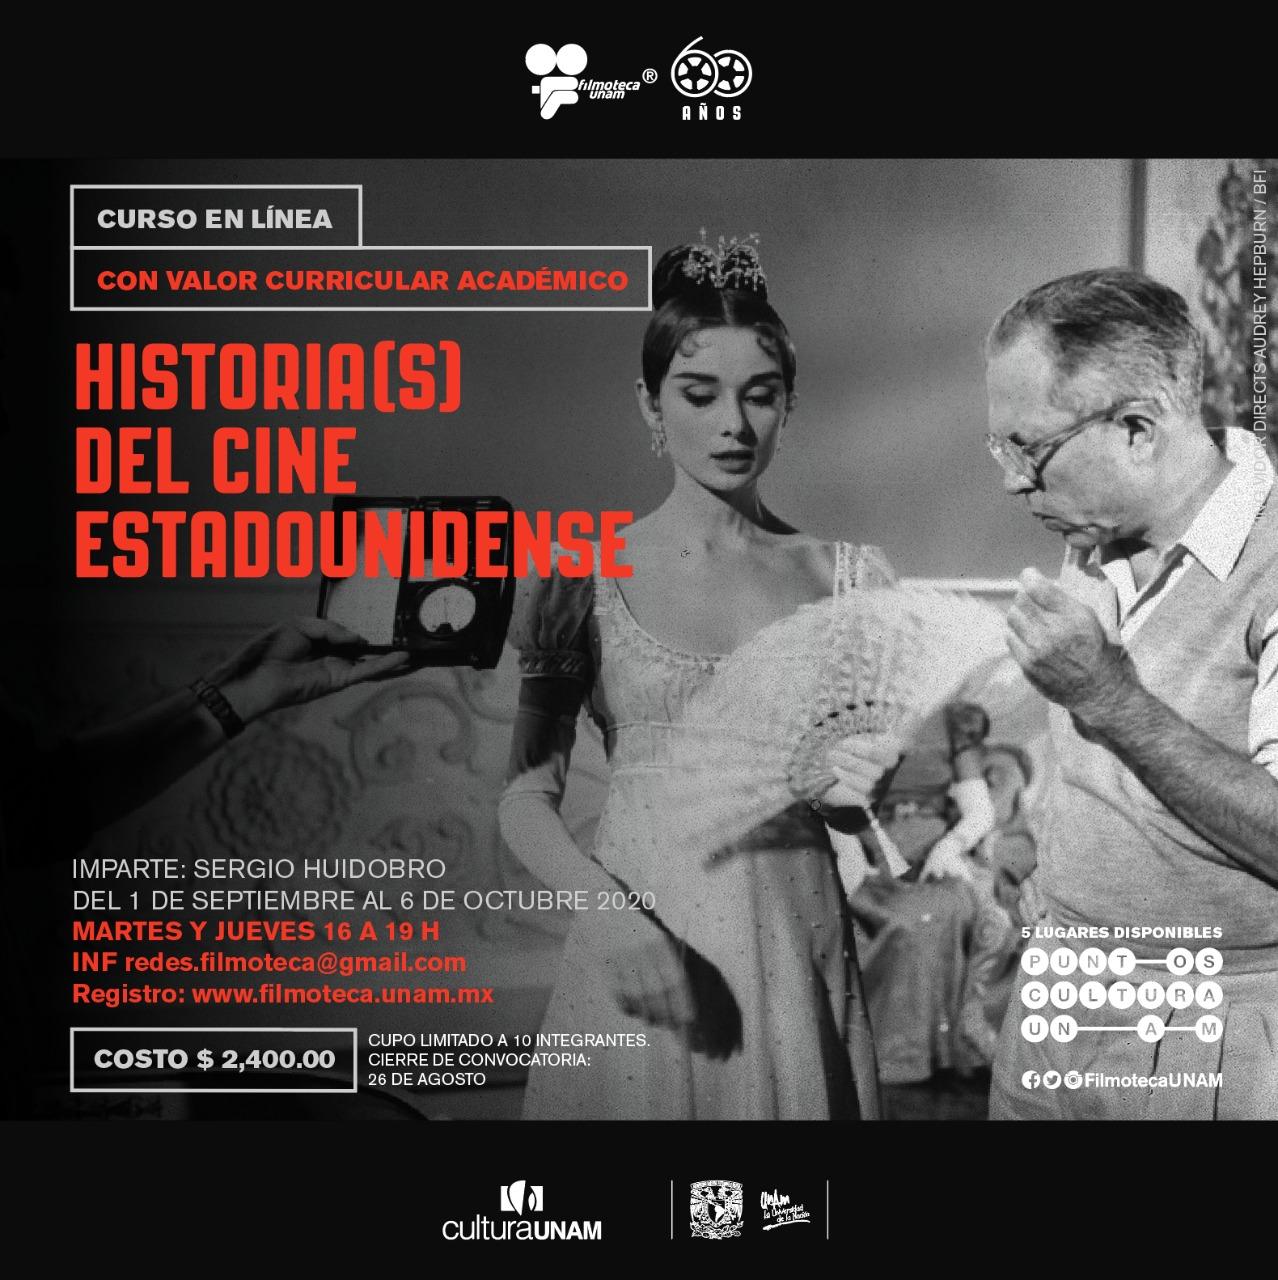 Historia (as) cine estaodunidense